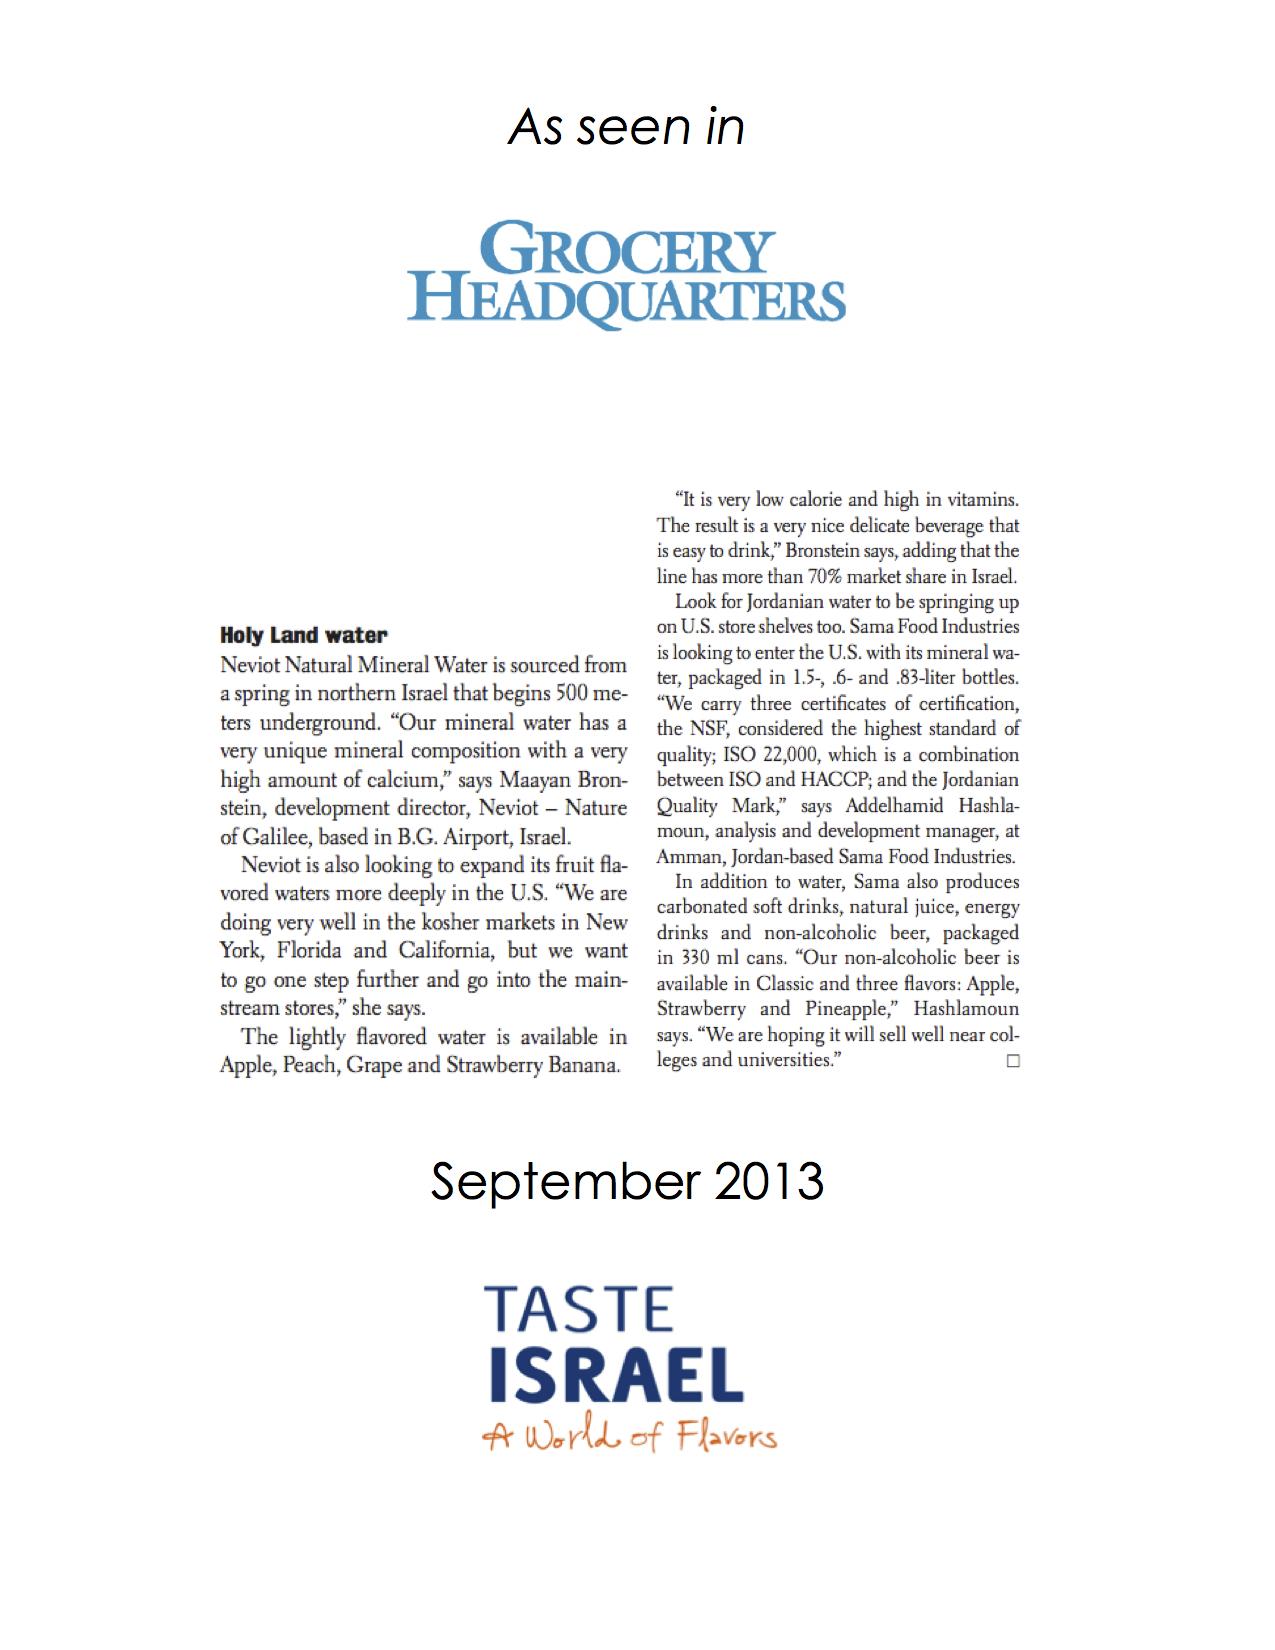 israel-asseenin-groceryheadquarters2 copy.jpg